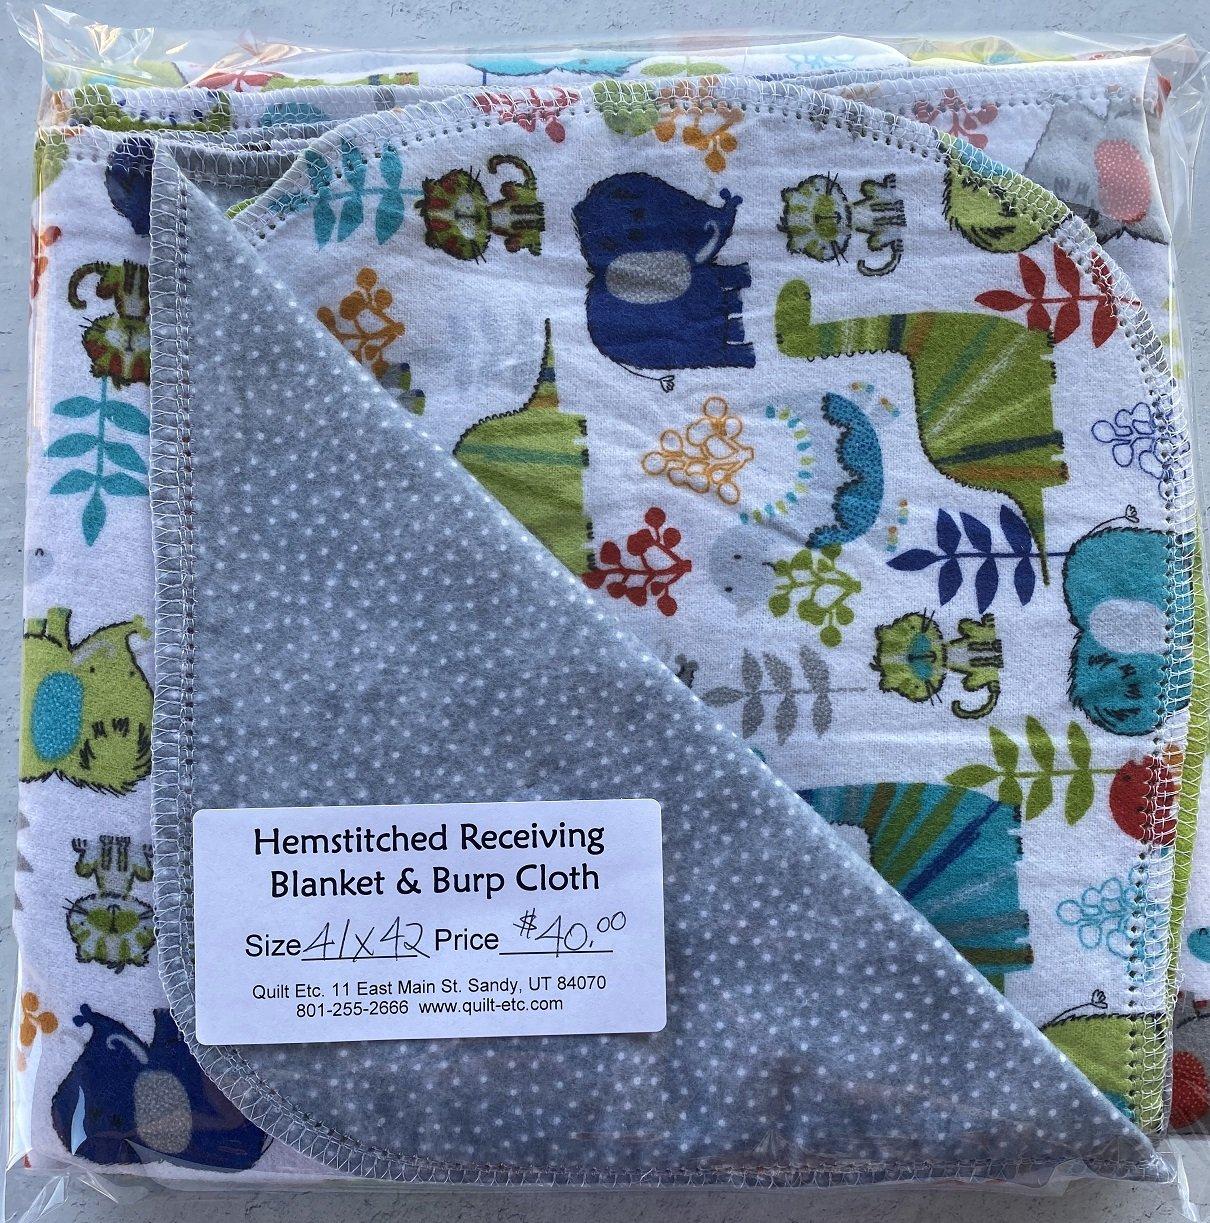 Hemstitched Receiving Blanket & Burp Cloth 1